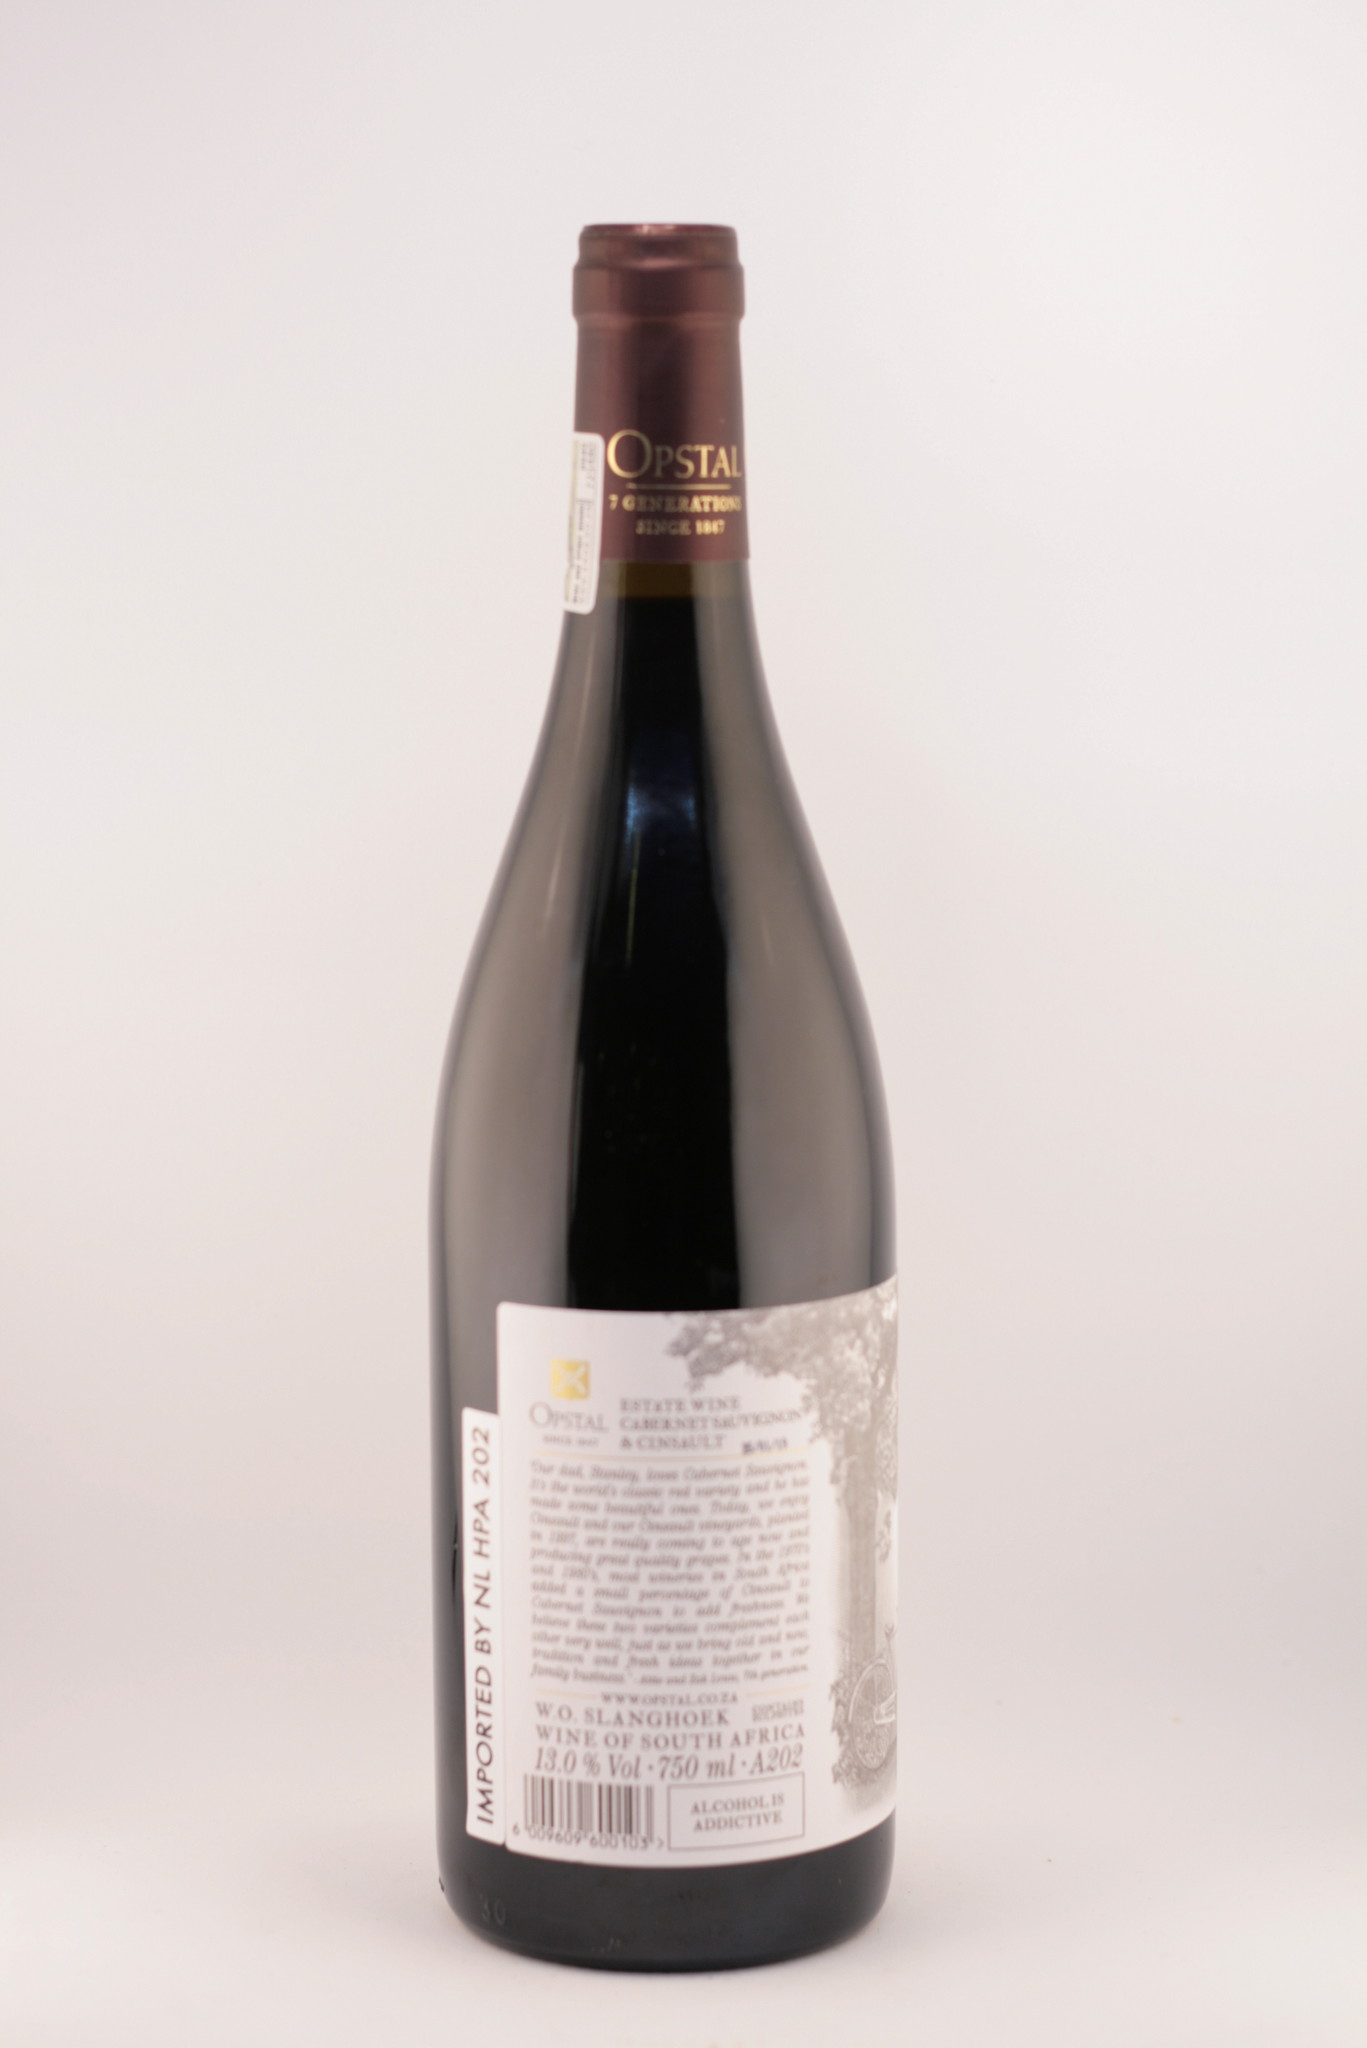 Estate wine |Opstal |Slanghoek |Cabernet sauvignon - Cincault | 2018